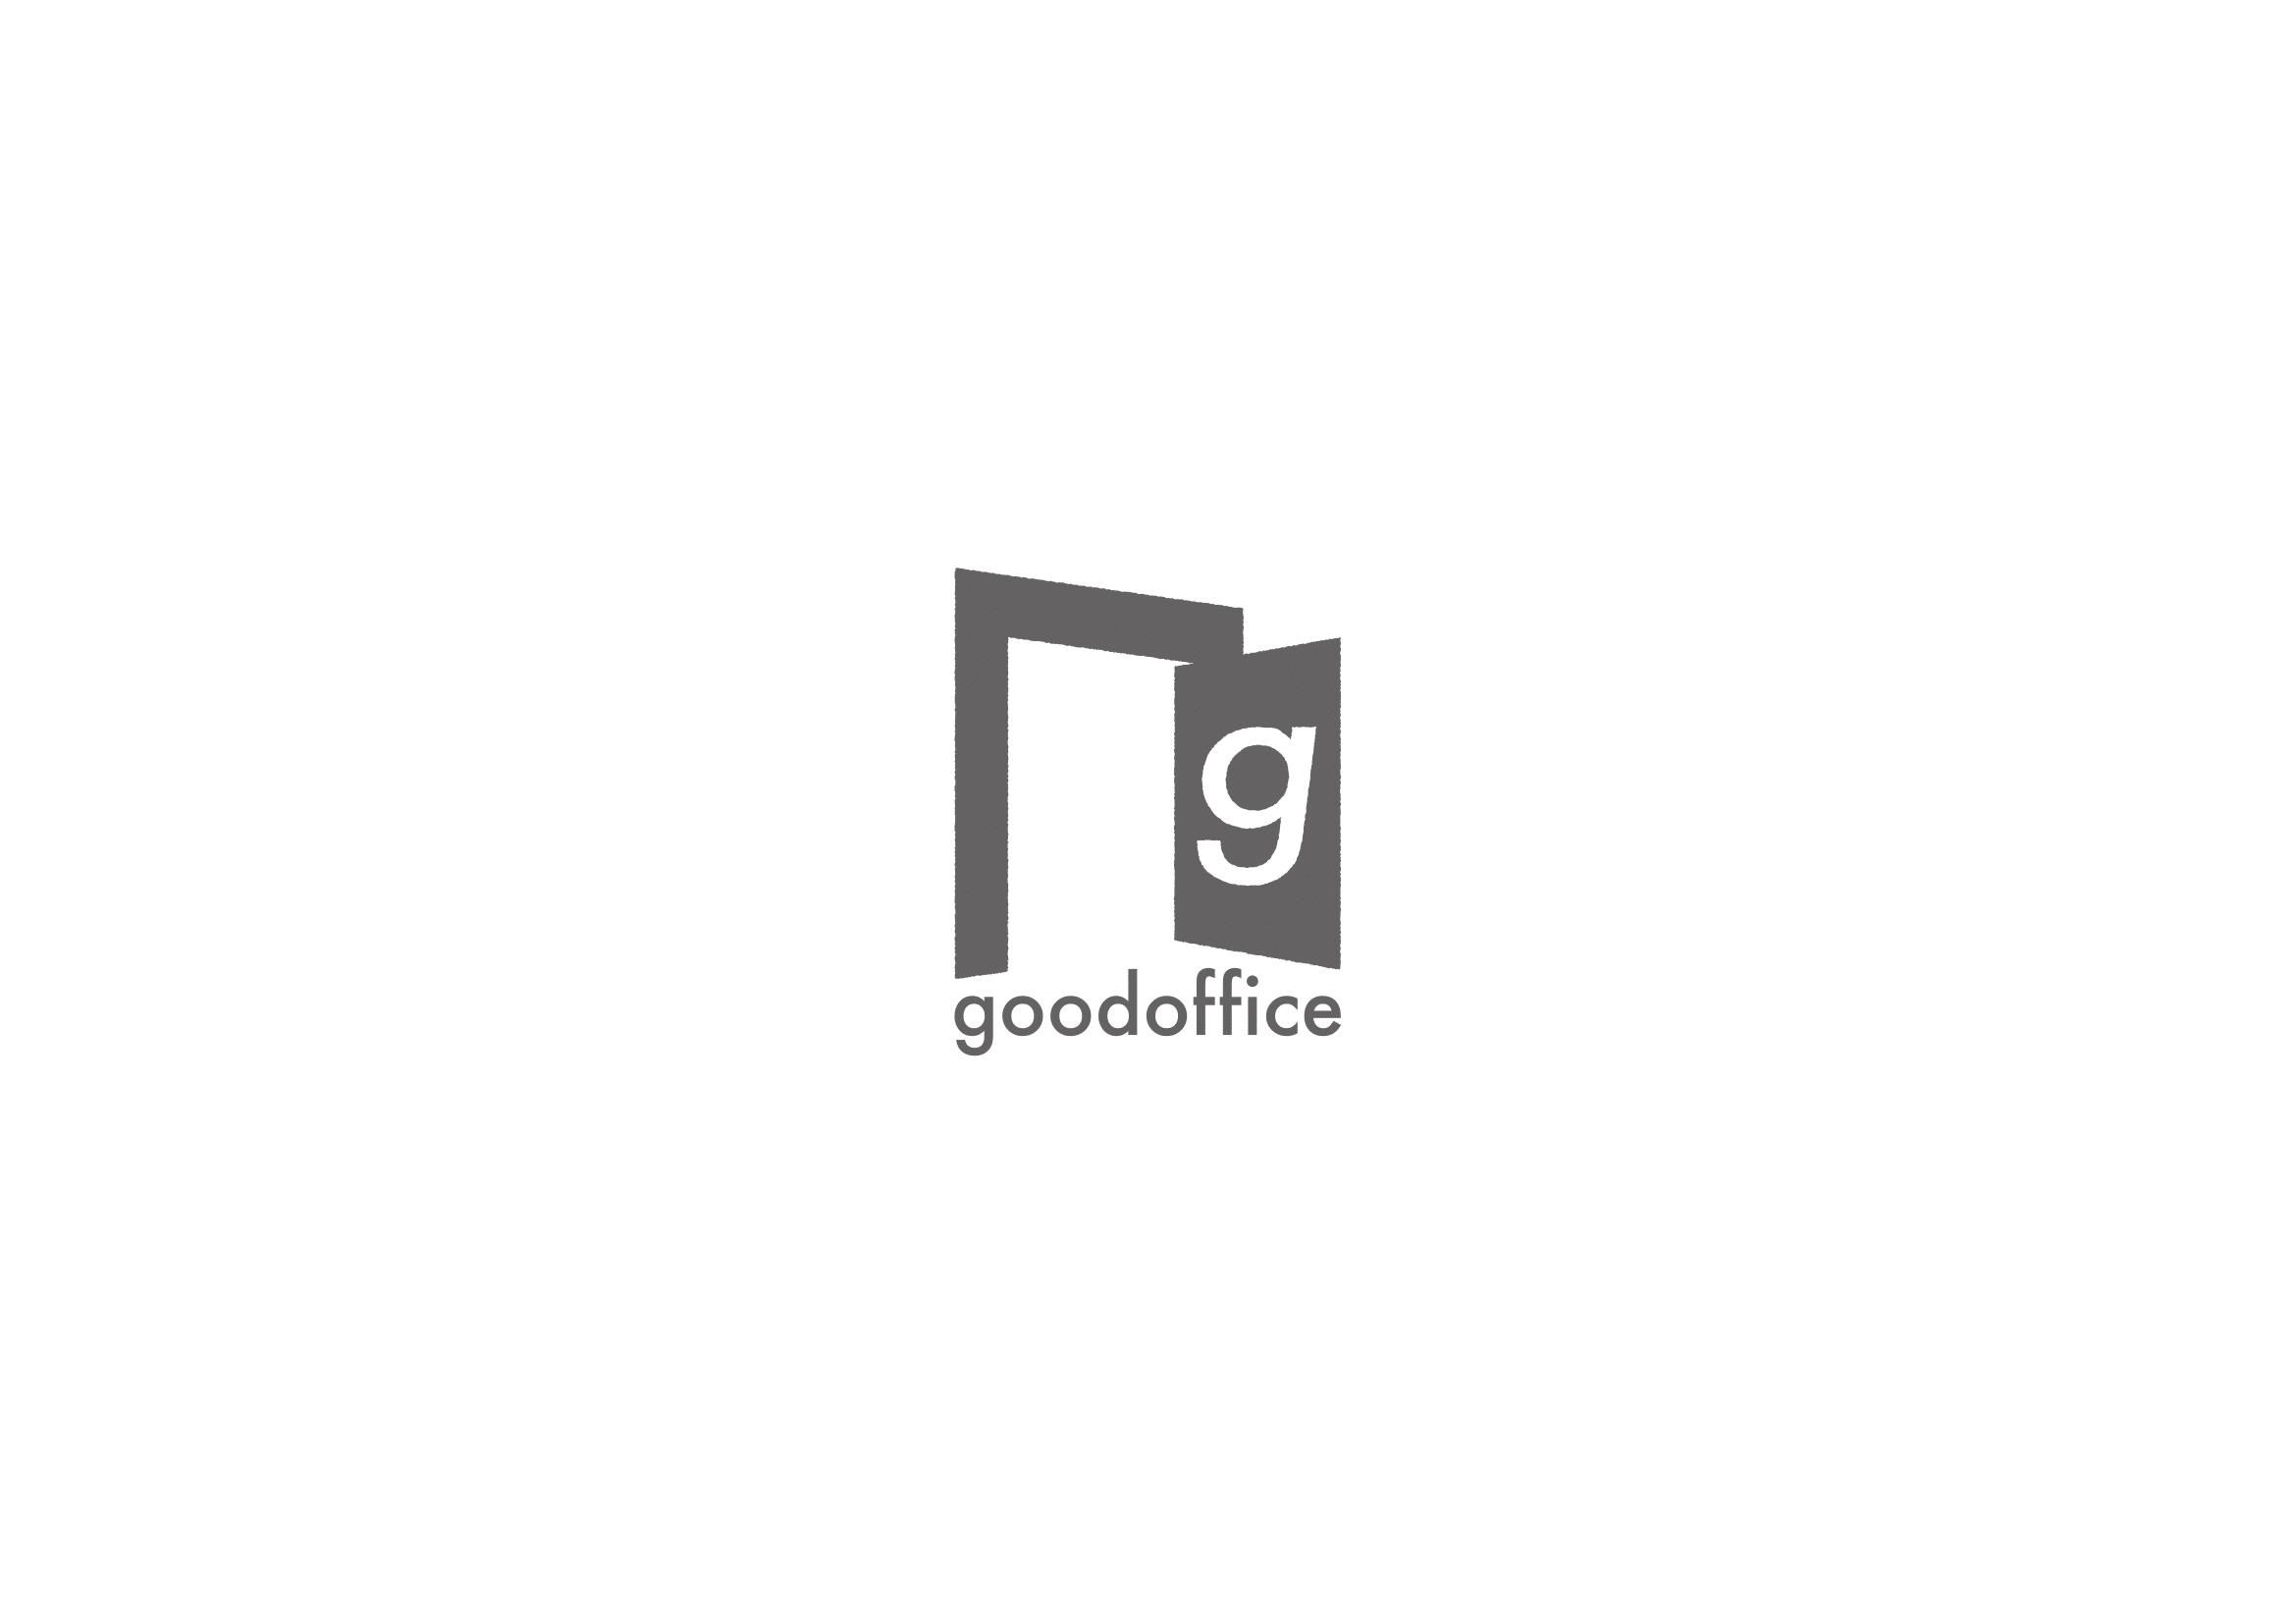 goodoffice